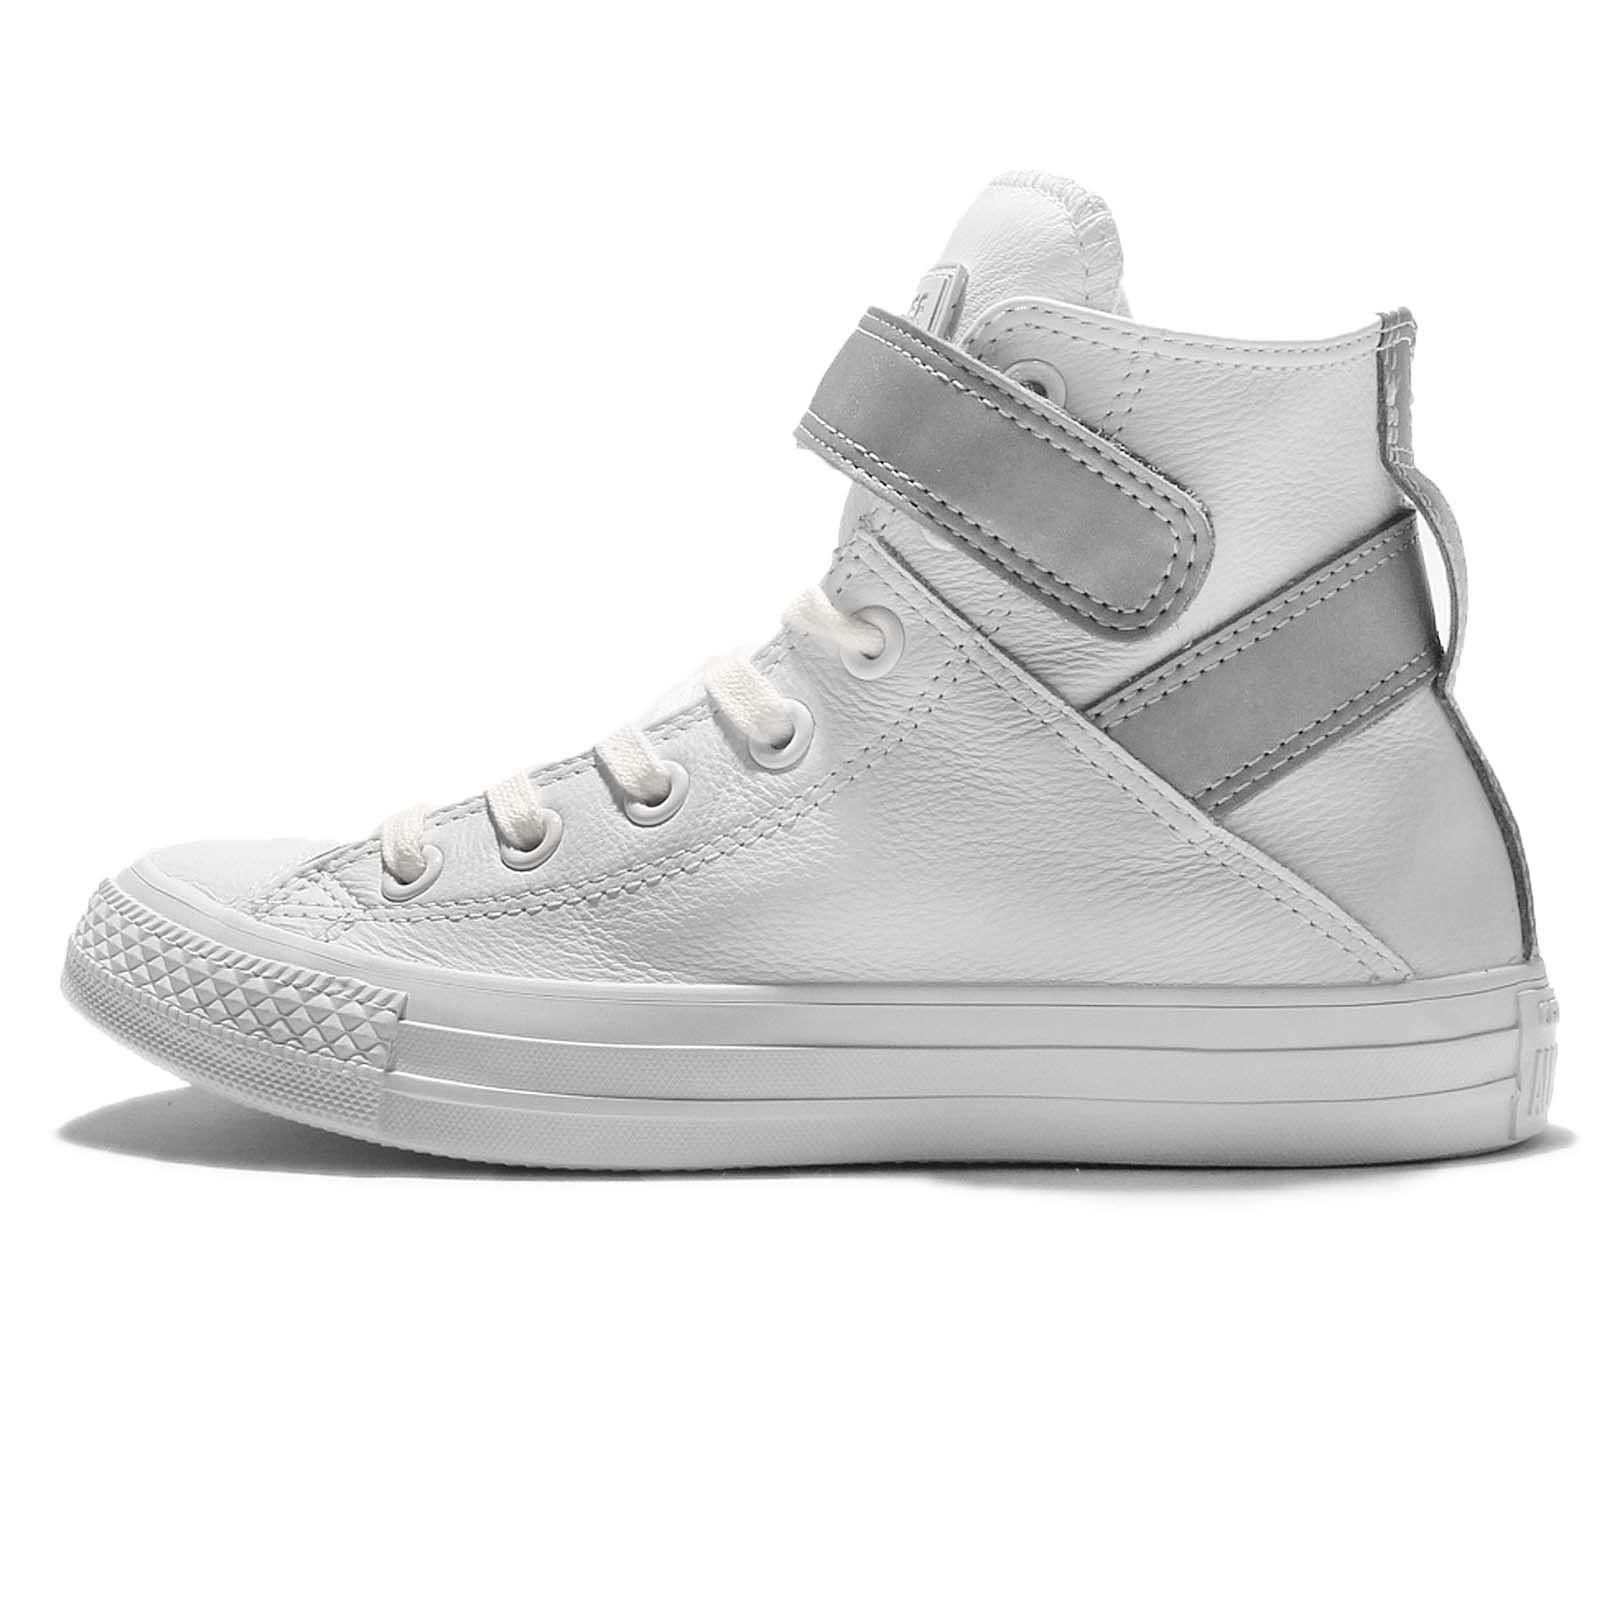 d7722ee5286 Converse Converse Chuck Taylor All Star Reflective Brea High Top Shoe womens  skateboarding-shoes 553423C 6